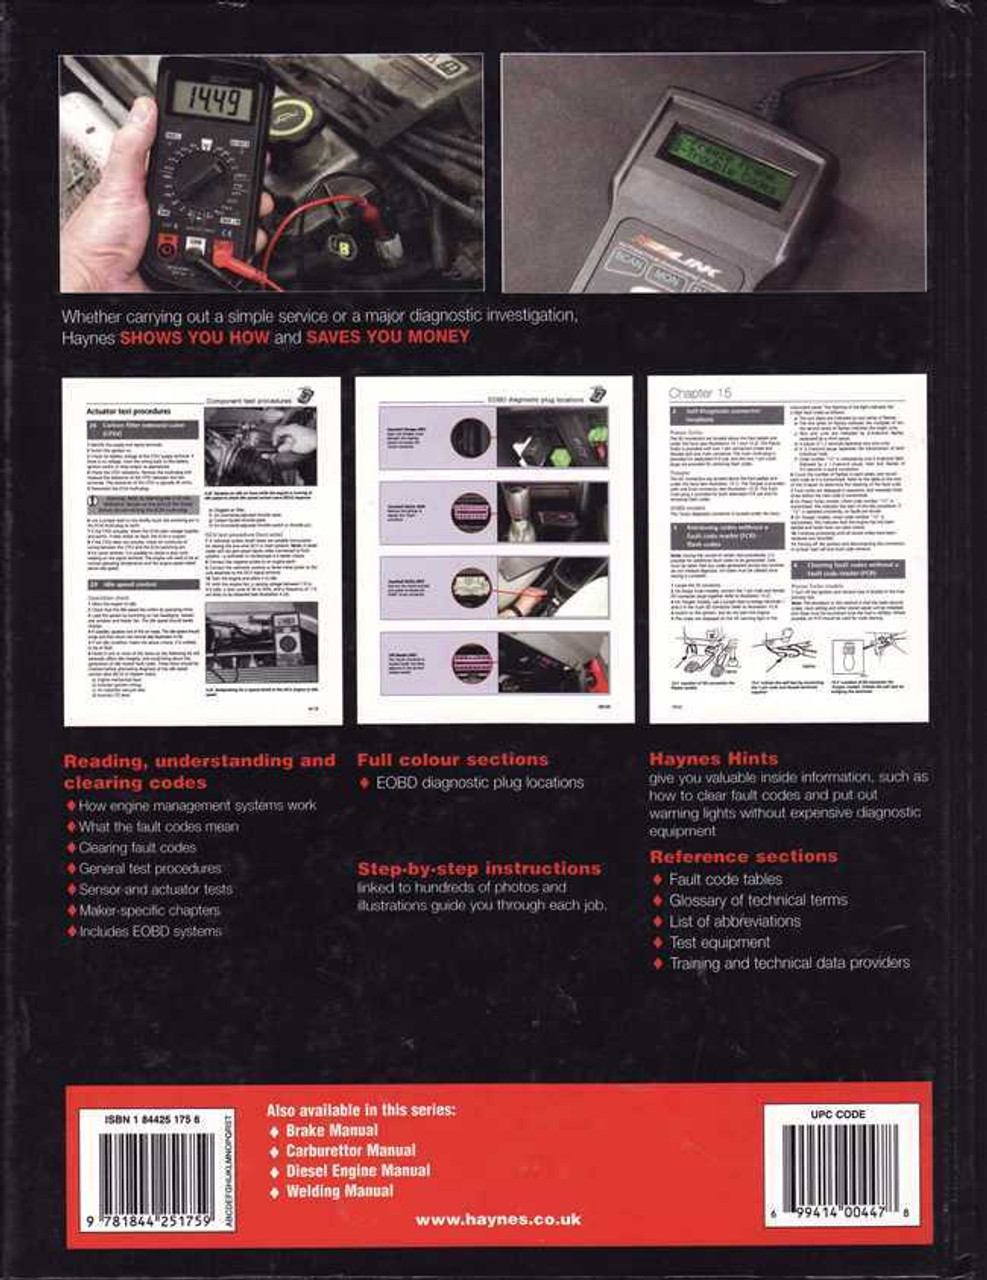 magneti marelli g6 manual